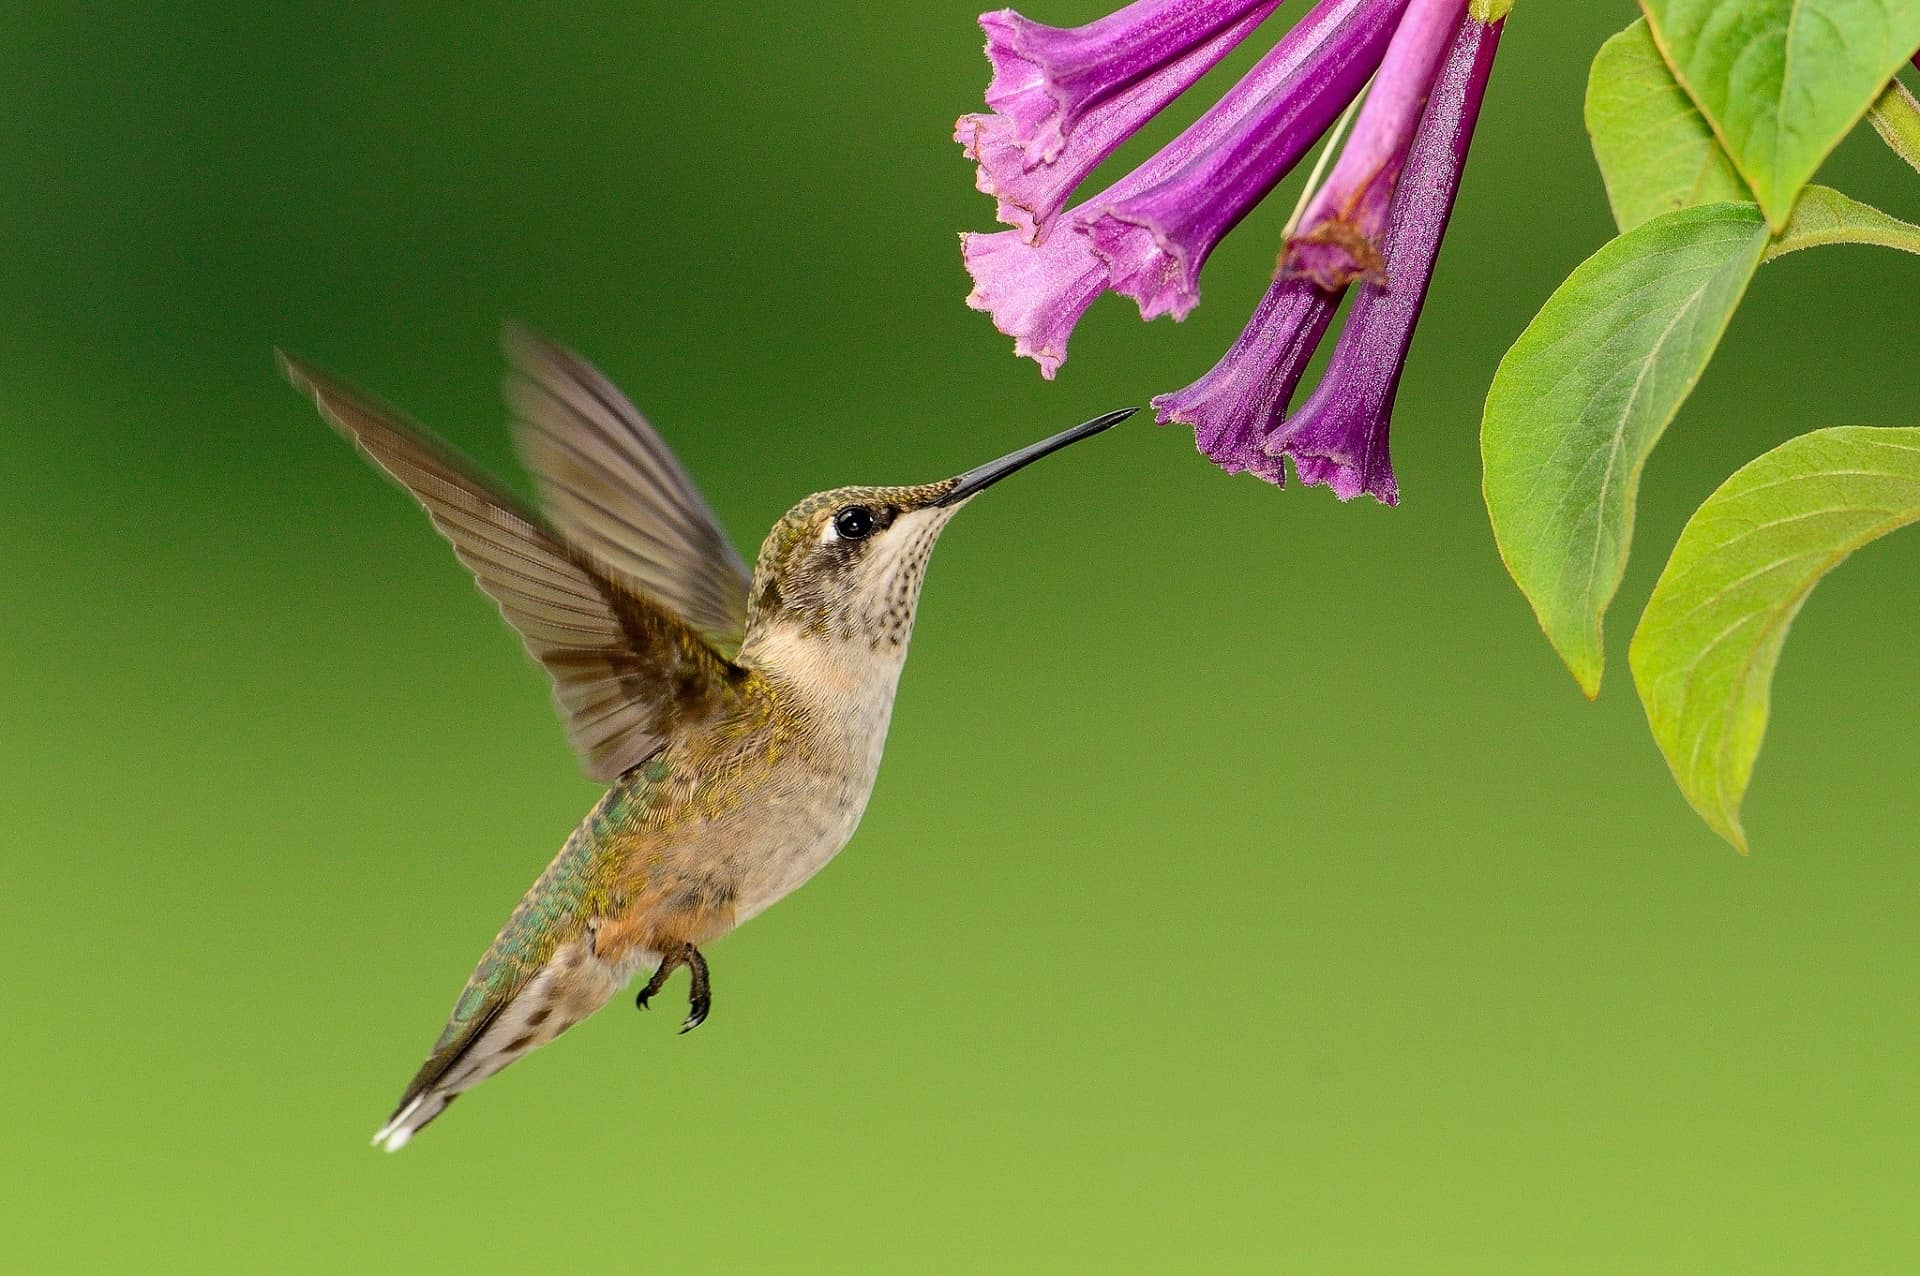 hummingbird-1056383